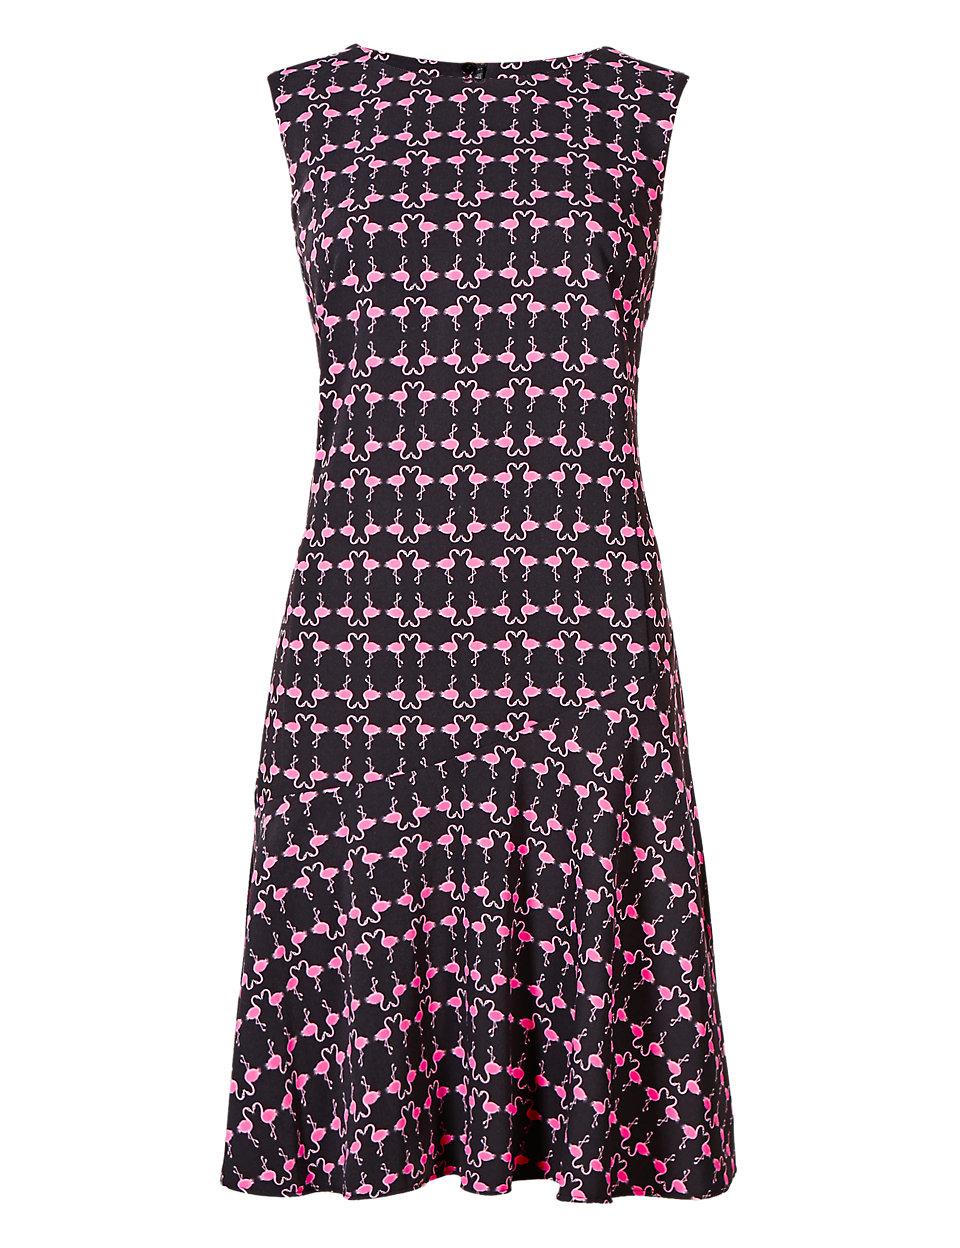 Conversational Print Skater Dress £45 from Marks & Spencer